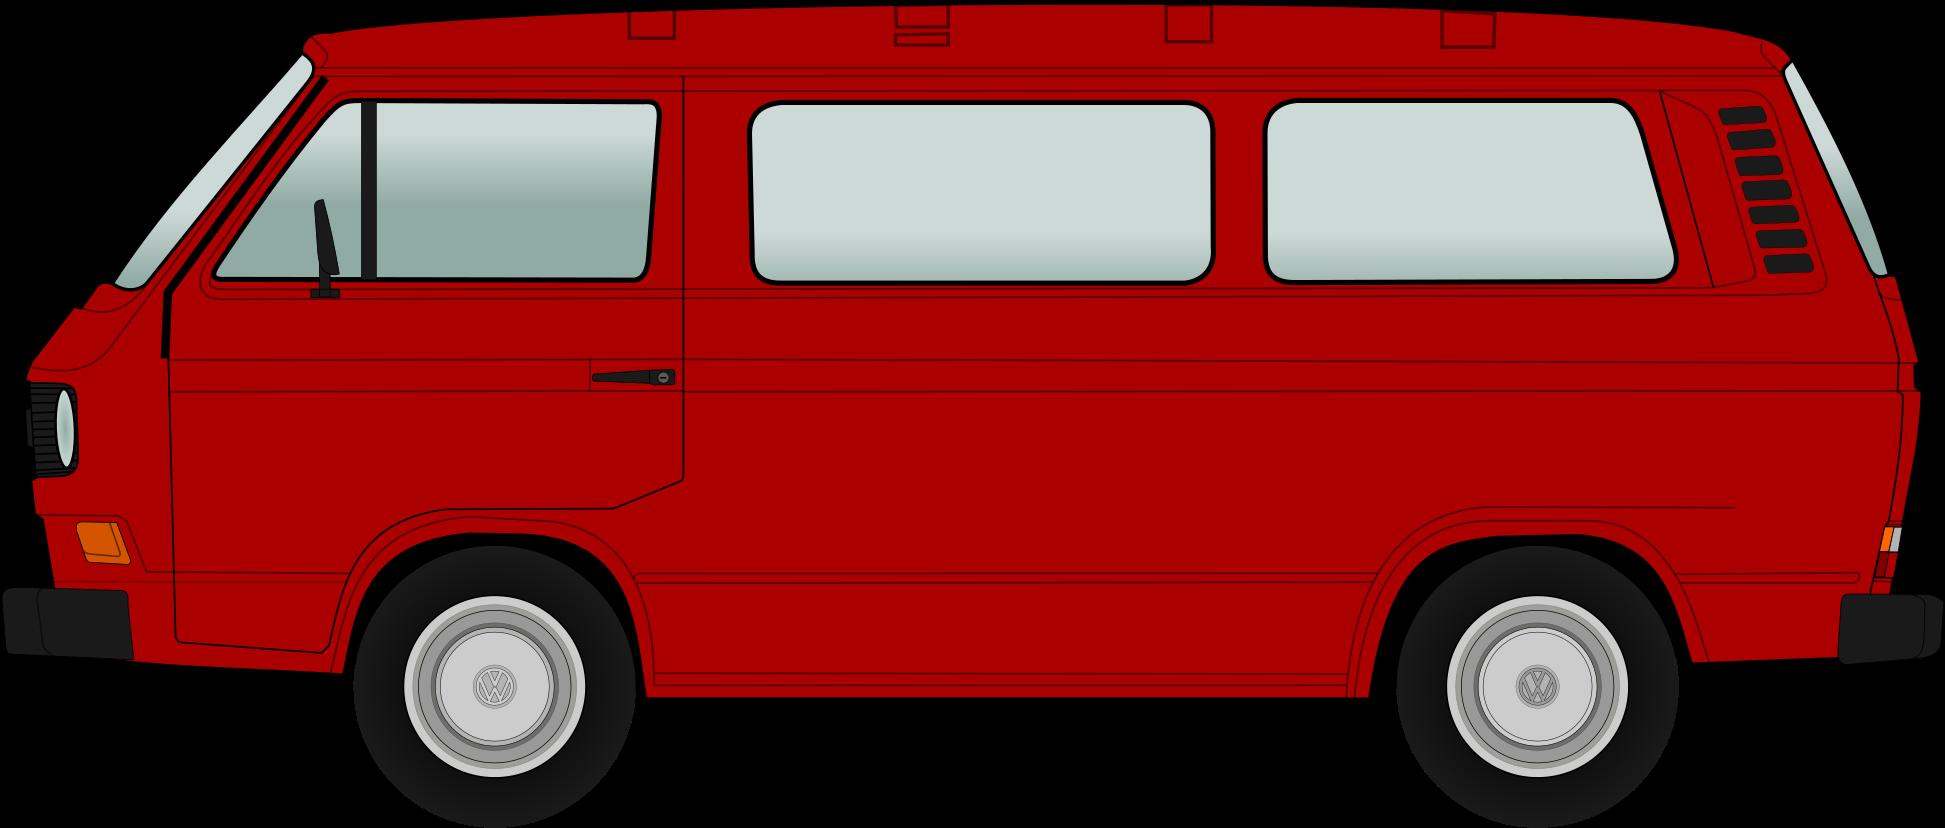 File Transporter T A Wikimedia Commons Open Type 4 Vw Van Clipart Full Size Clipart 3648807 Pinclipart Ghost clipart citroen h van van houten compact van van cleef arrow clipart van. file transporter t a wikimedia commons